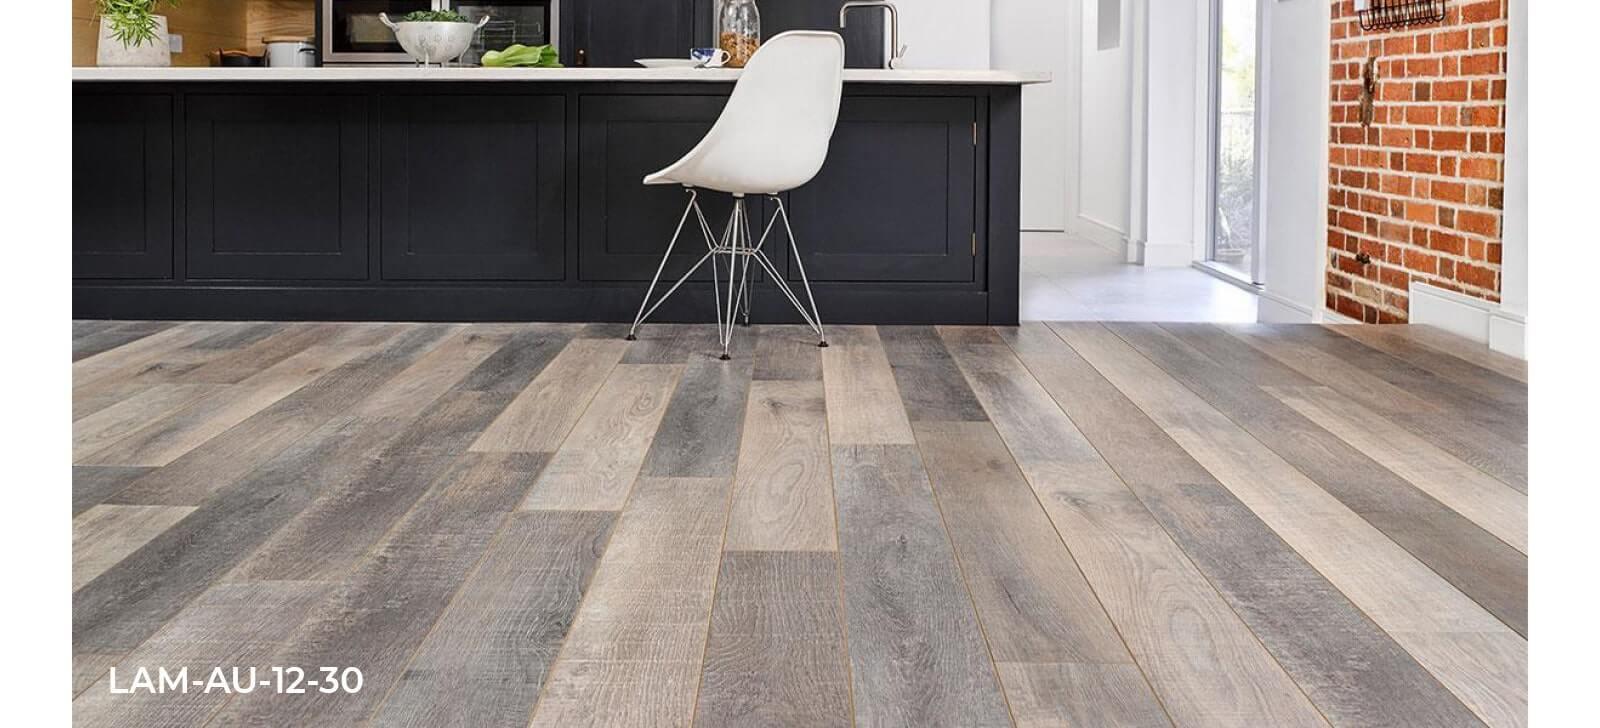 Audacity Woodland Oak laminate flooring Kitchen roomset